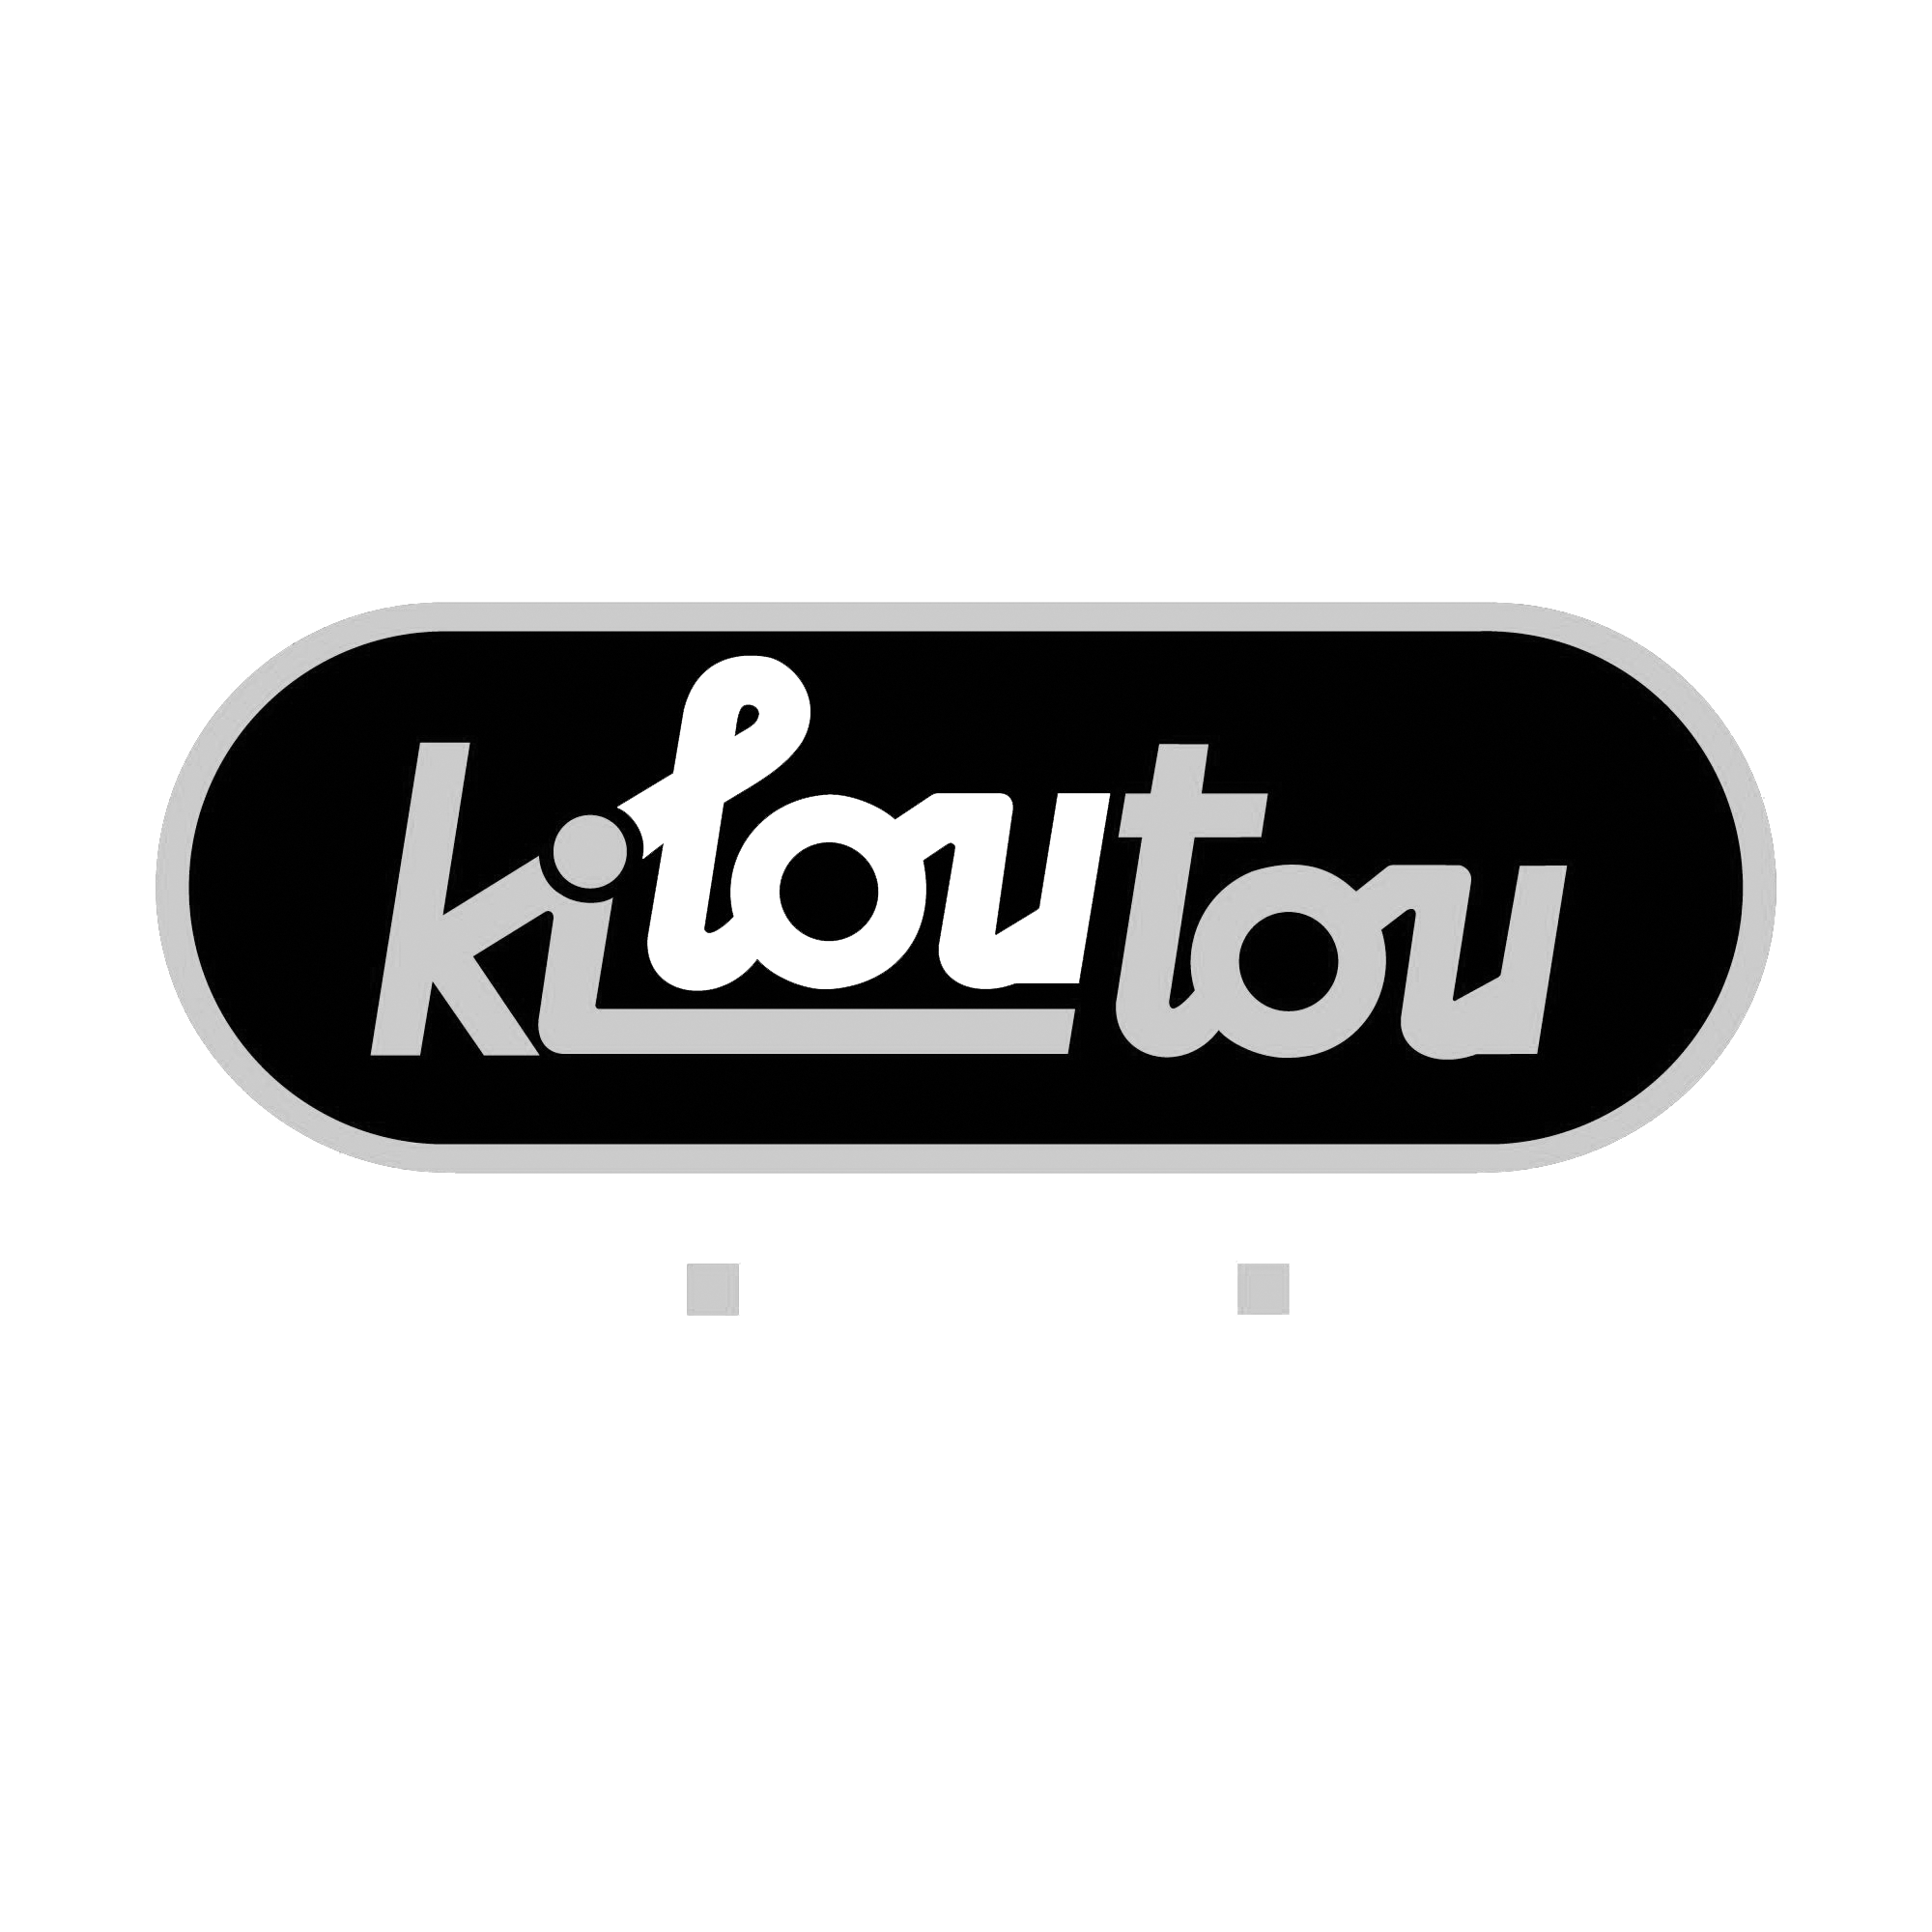 2000px-Kiloutou.png